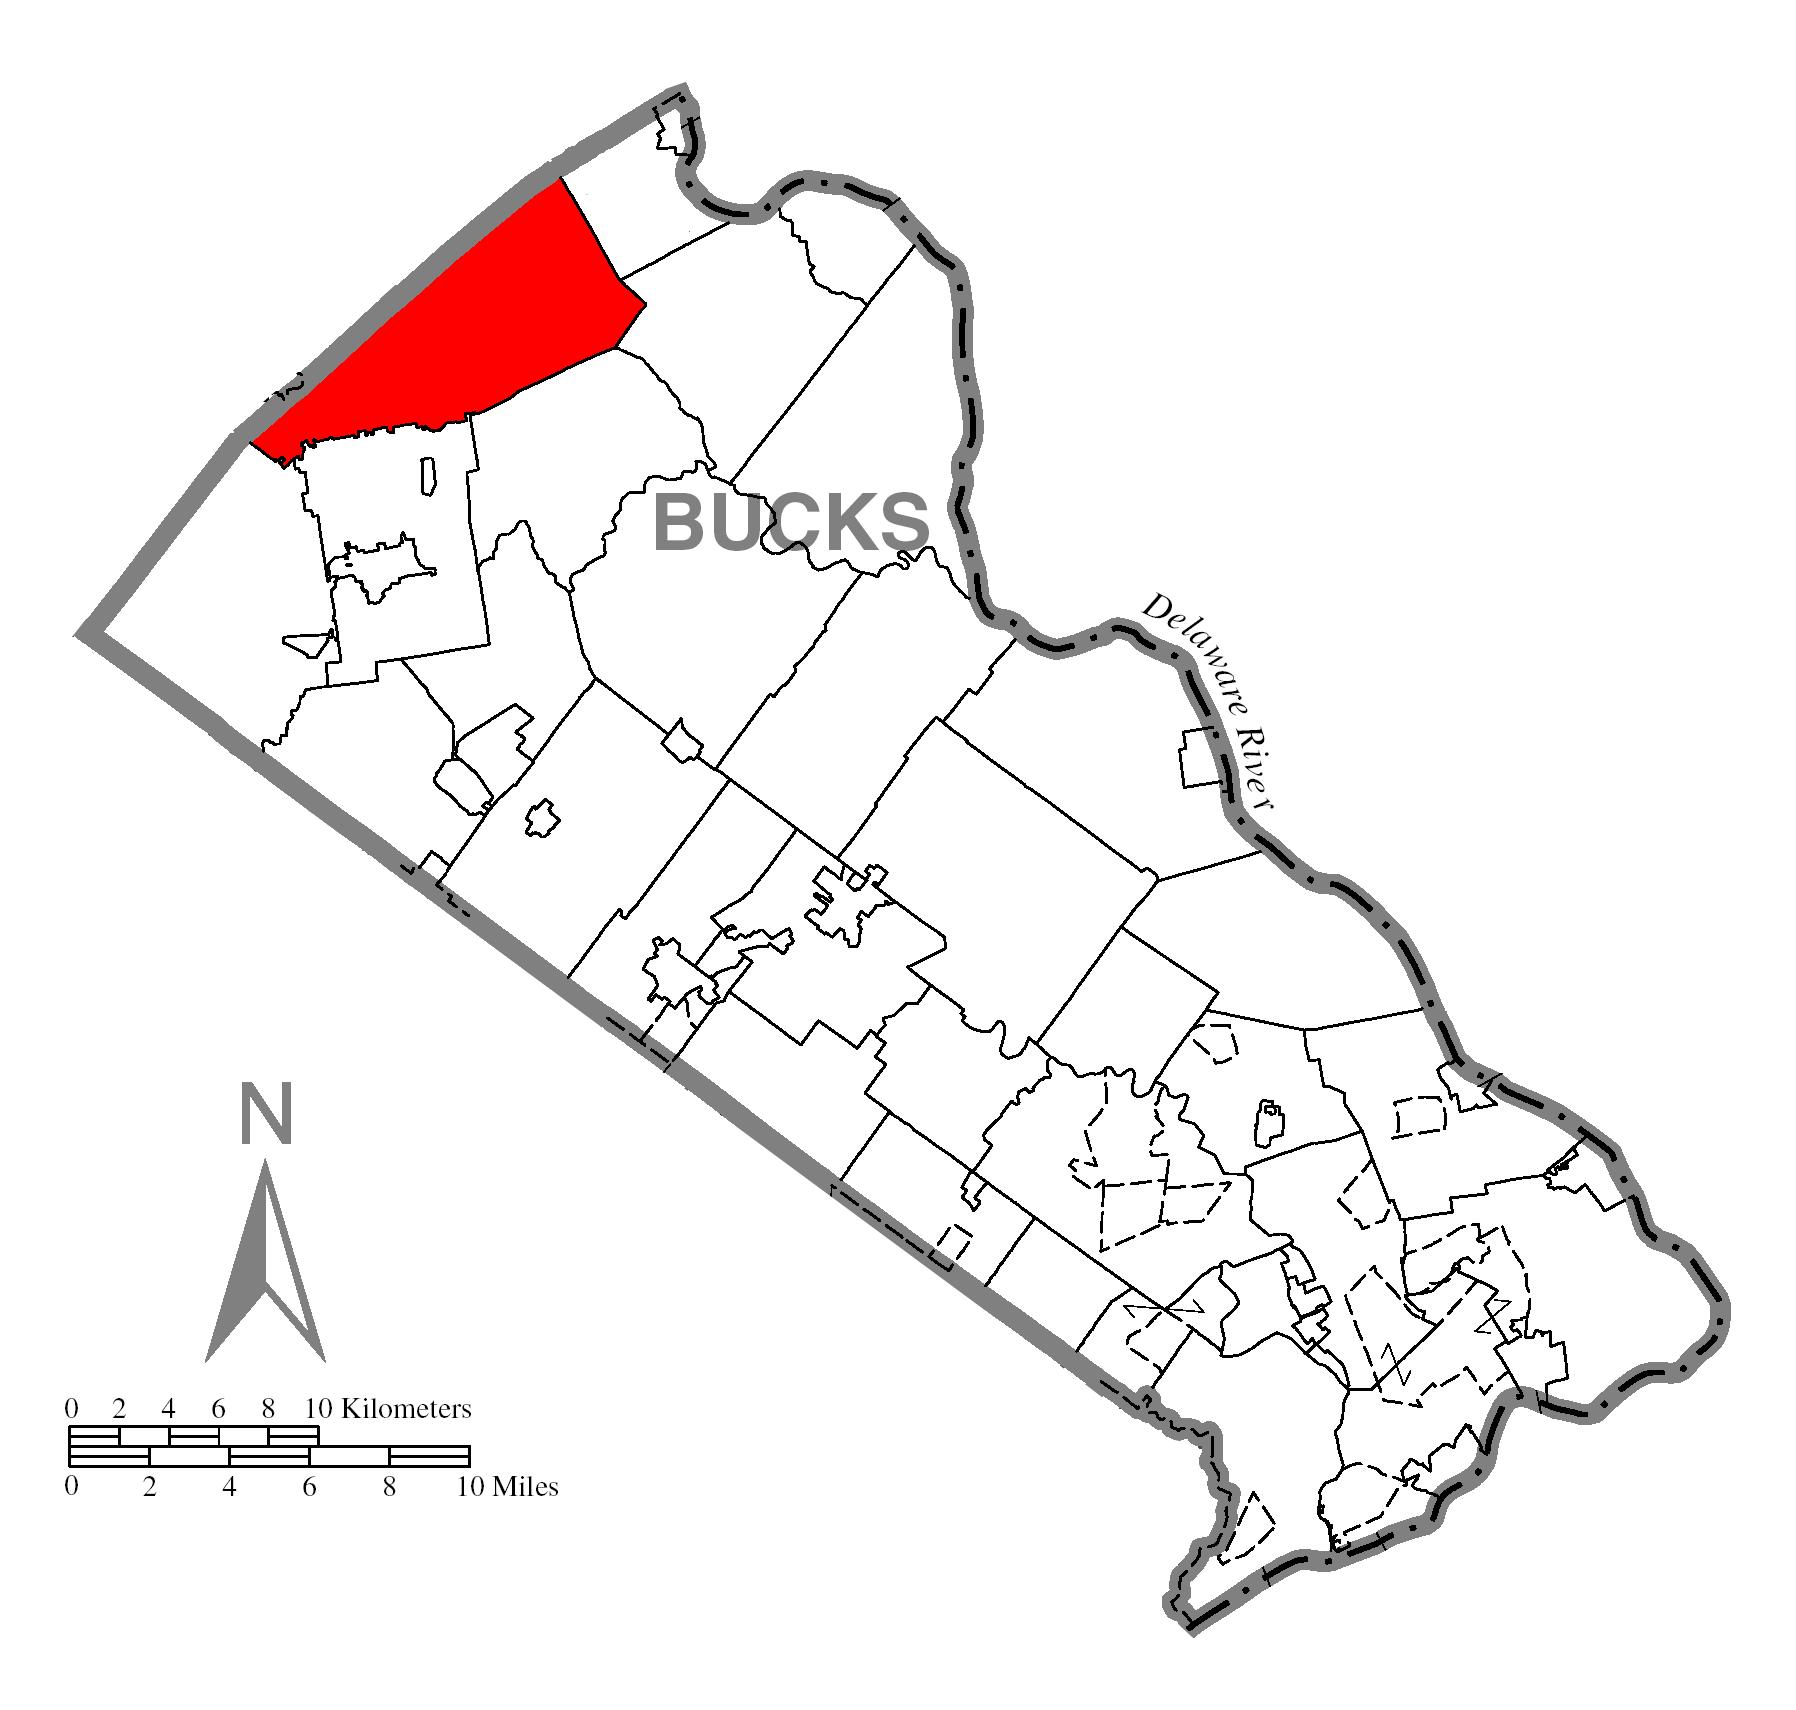 Springfield Township - Home on bucks montgomery map, buckingham map, pennsylvania map, monroe county, mercer county, levittown map, bucks pennsylvania, illinois community college district map, allegheny county, pa map, philadelphia map, northampton community college map, indiana county, worcester map, telford map, lehigh county, york county, cumberland county, montgomery county, chester county, berks county, bucks water map, lancaster county, bucks township map, new hope, bucks lake map, delaware county, quakertown map, central bucks school district map, new castle map, bucks co pa, philadelphia county, pennsylvania,